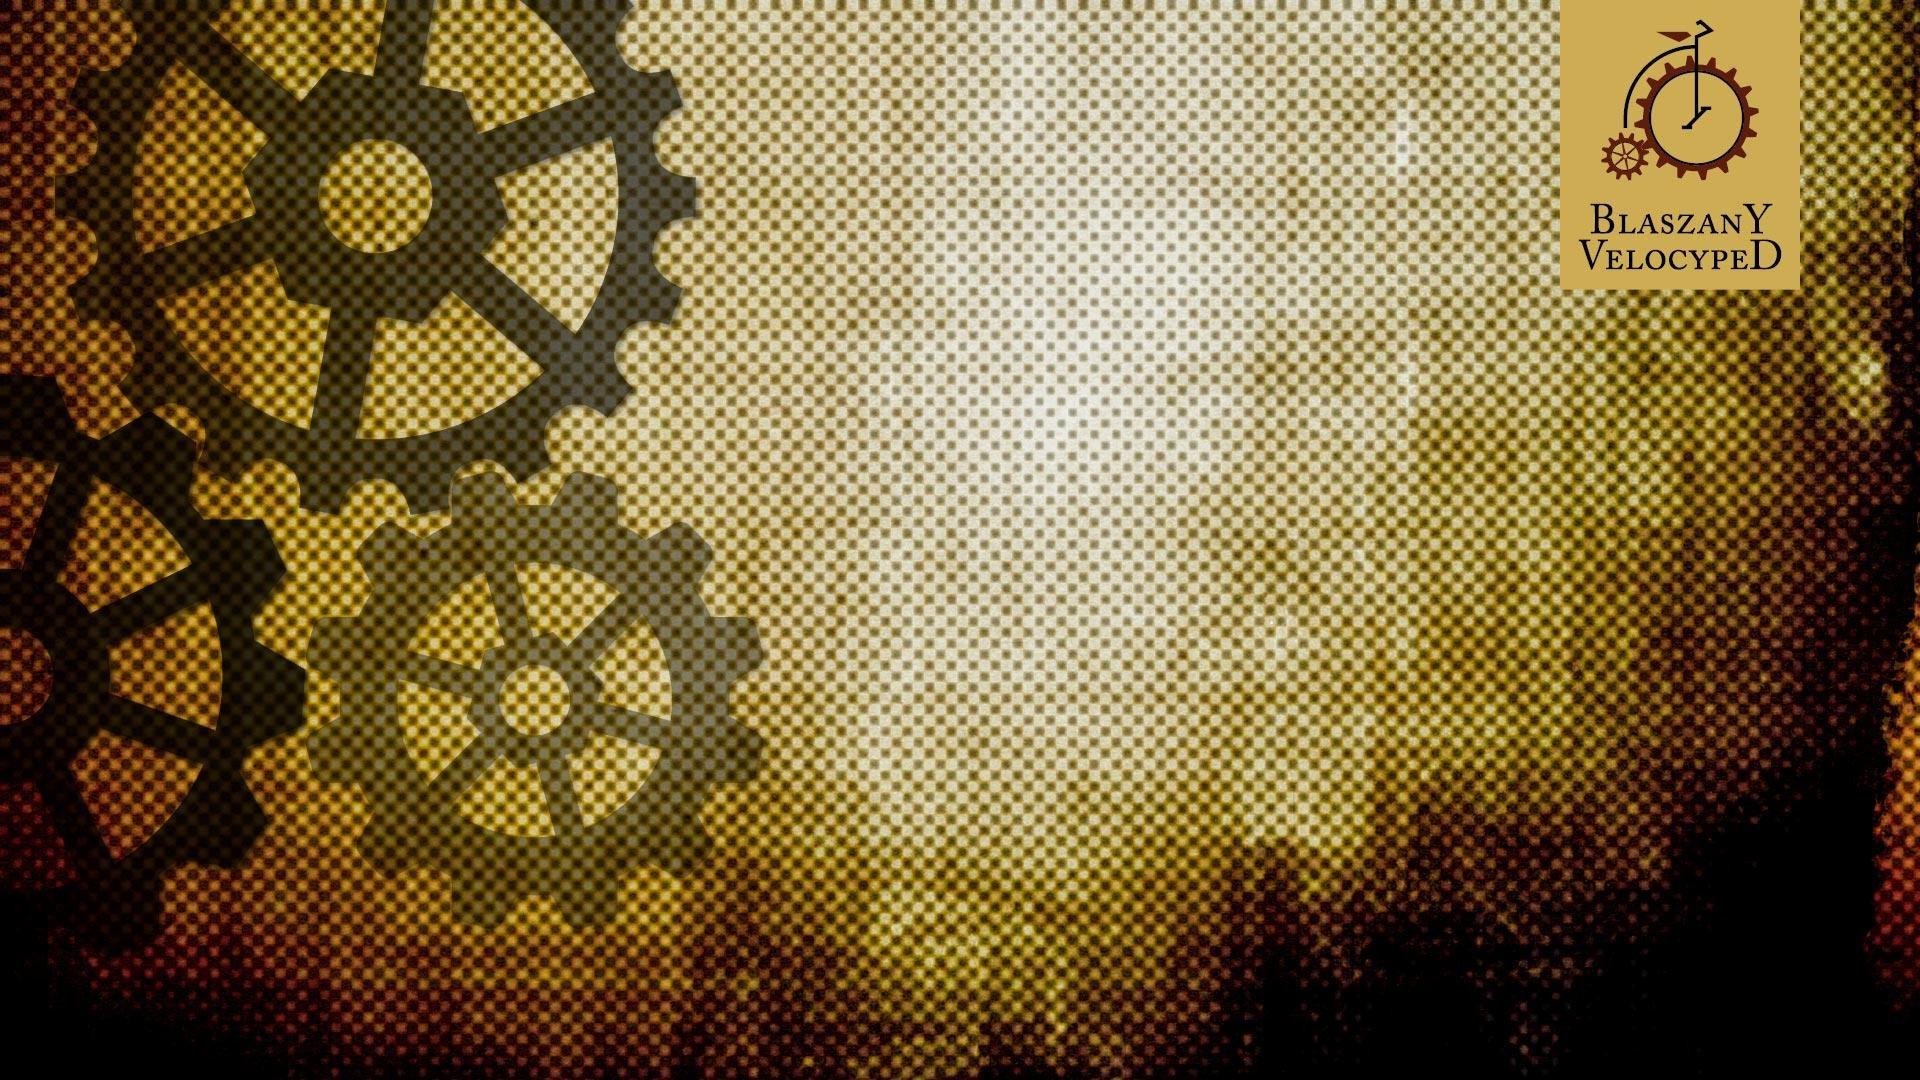 Steampunk-wallpaper-images-hd-desktop